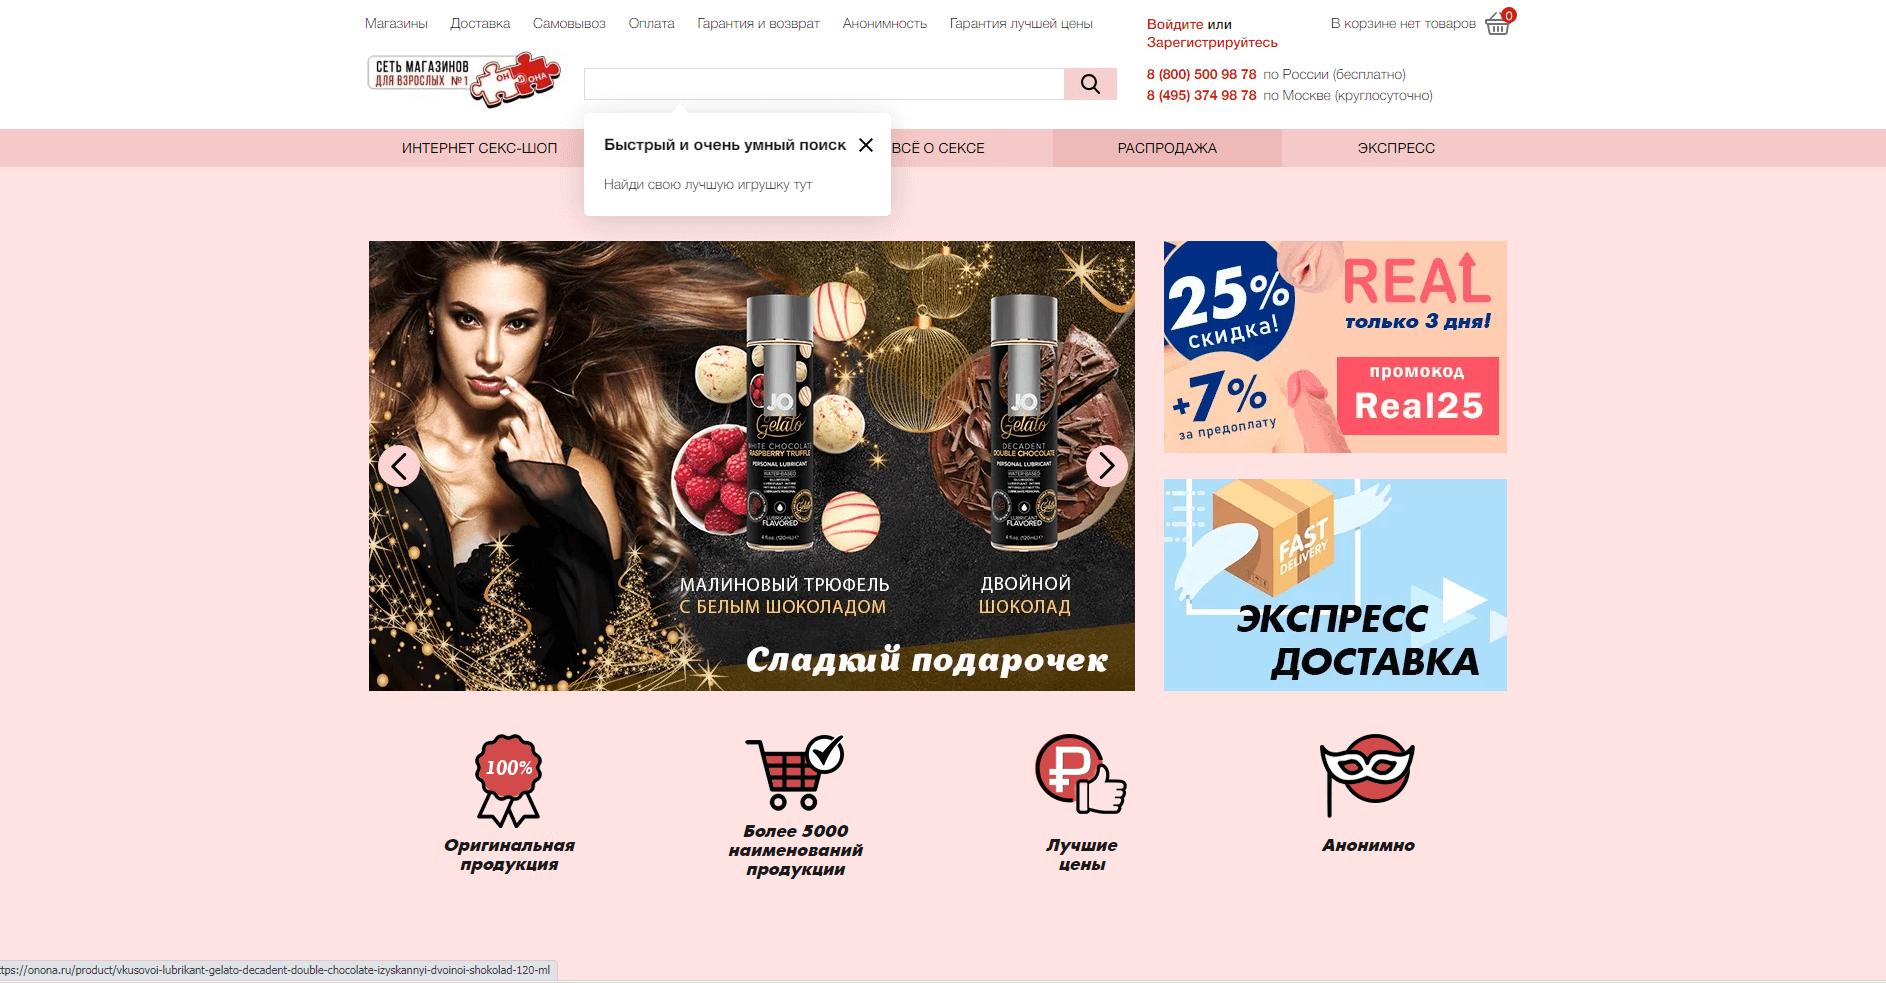 onona.ru website